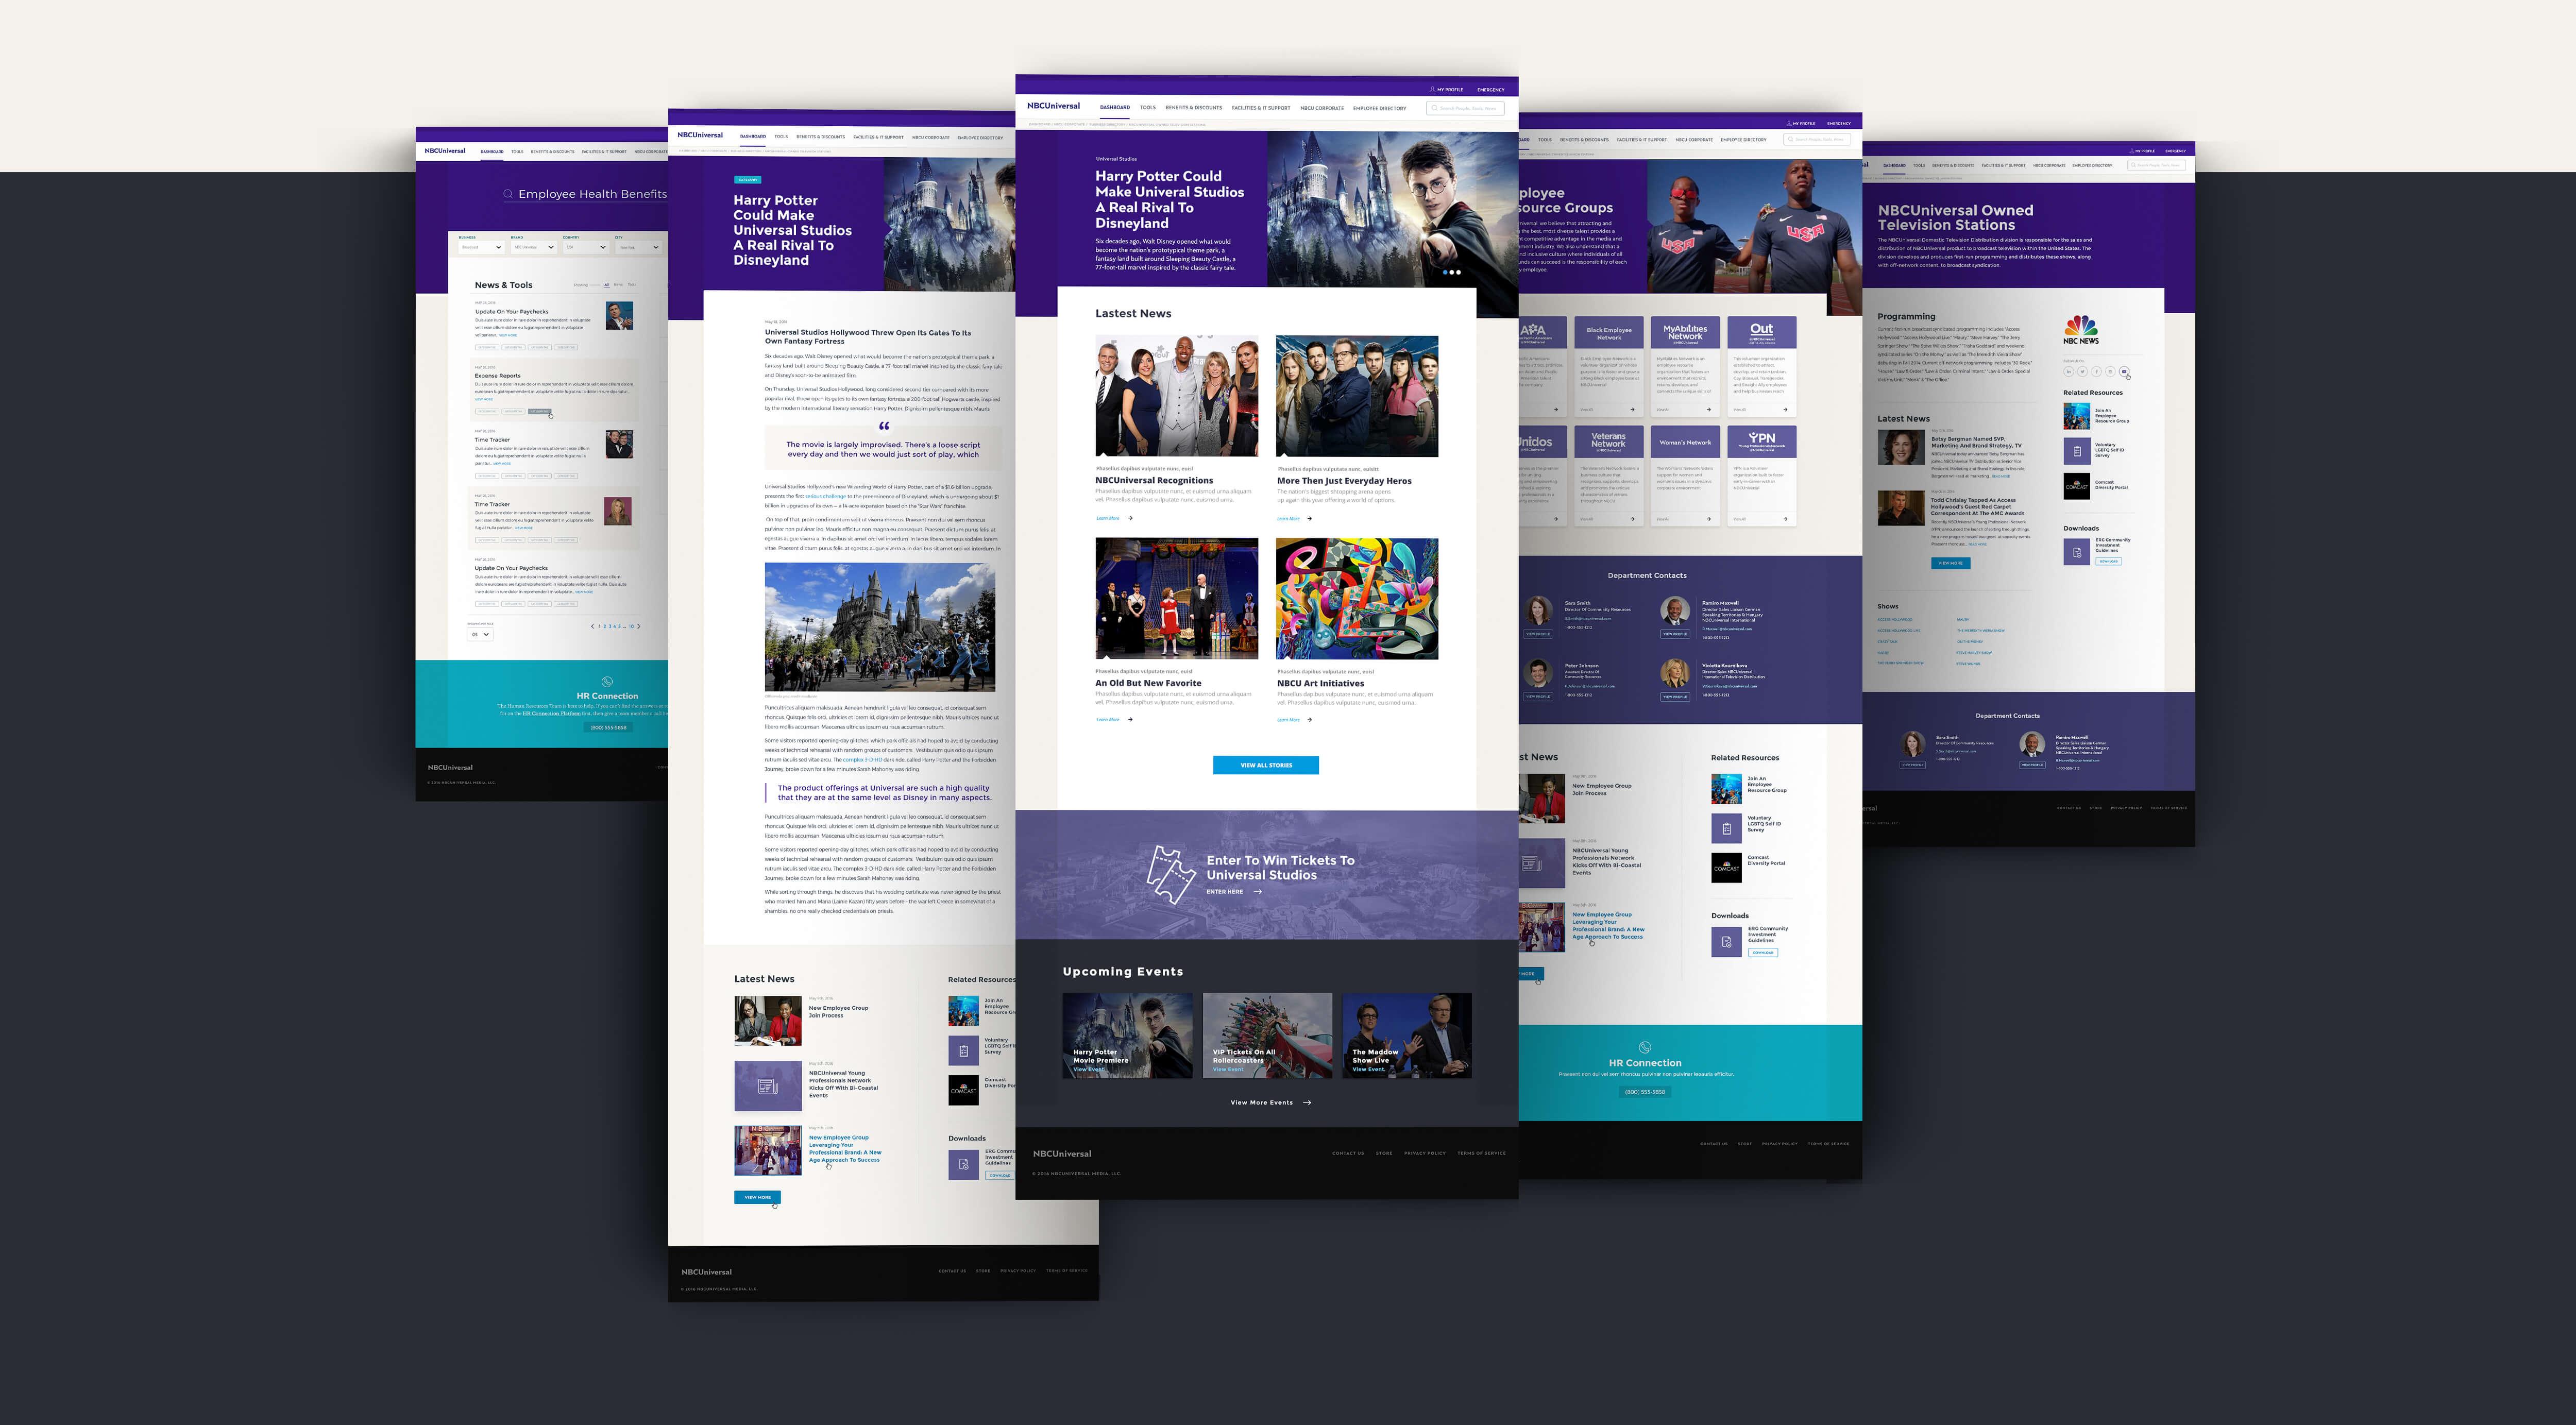 nbcu-web-content-3